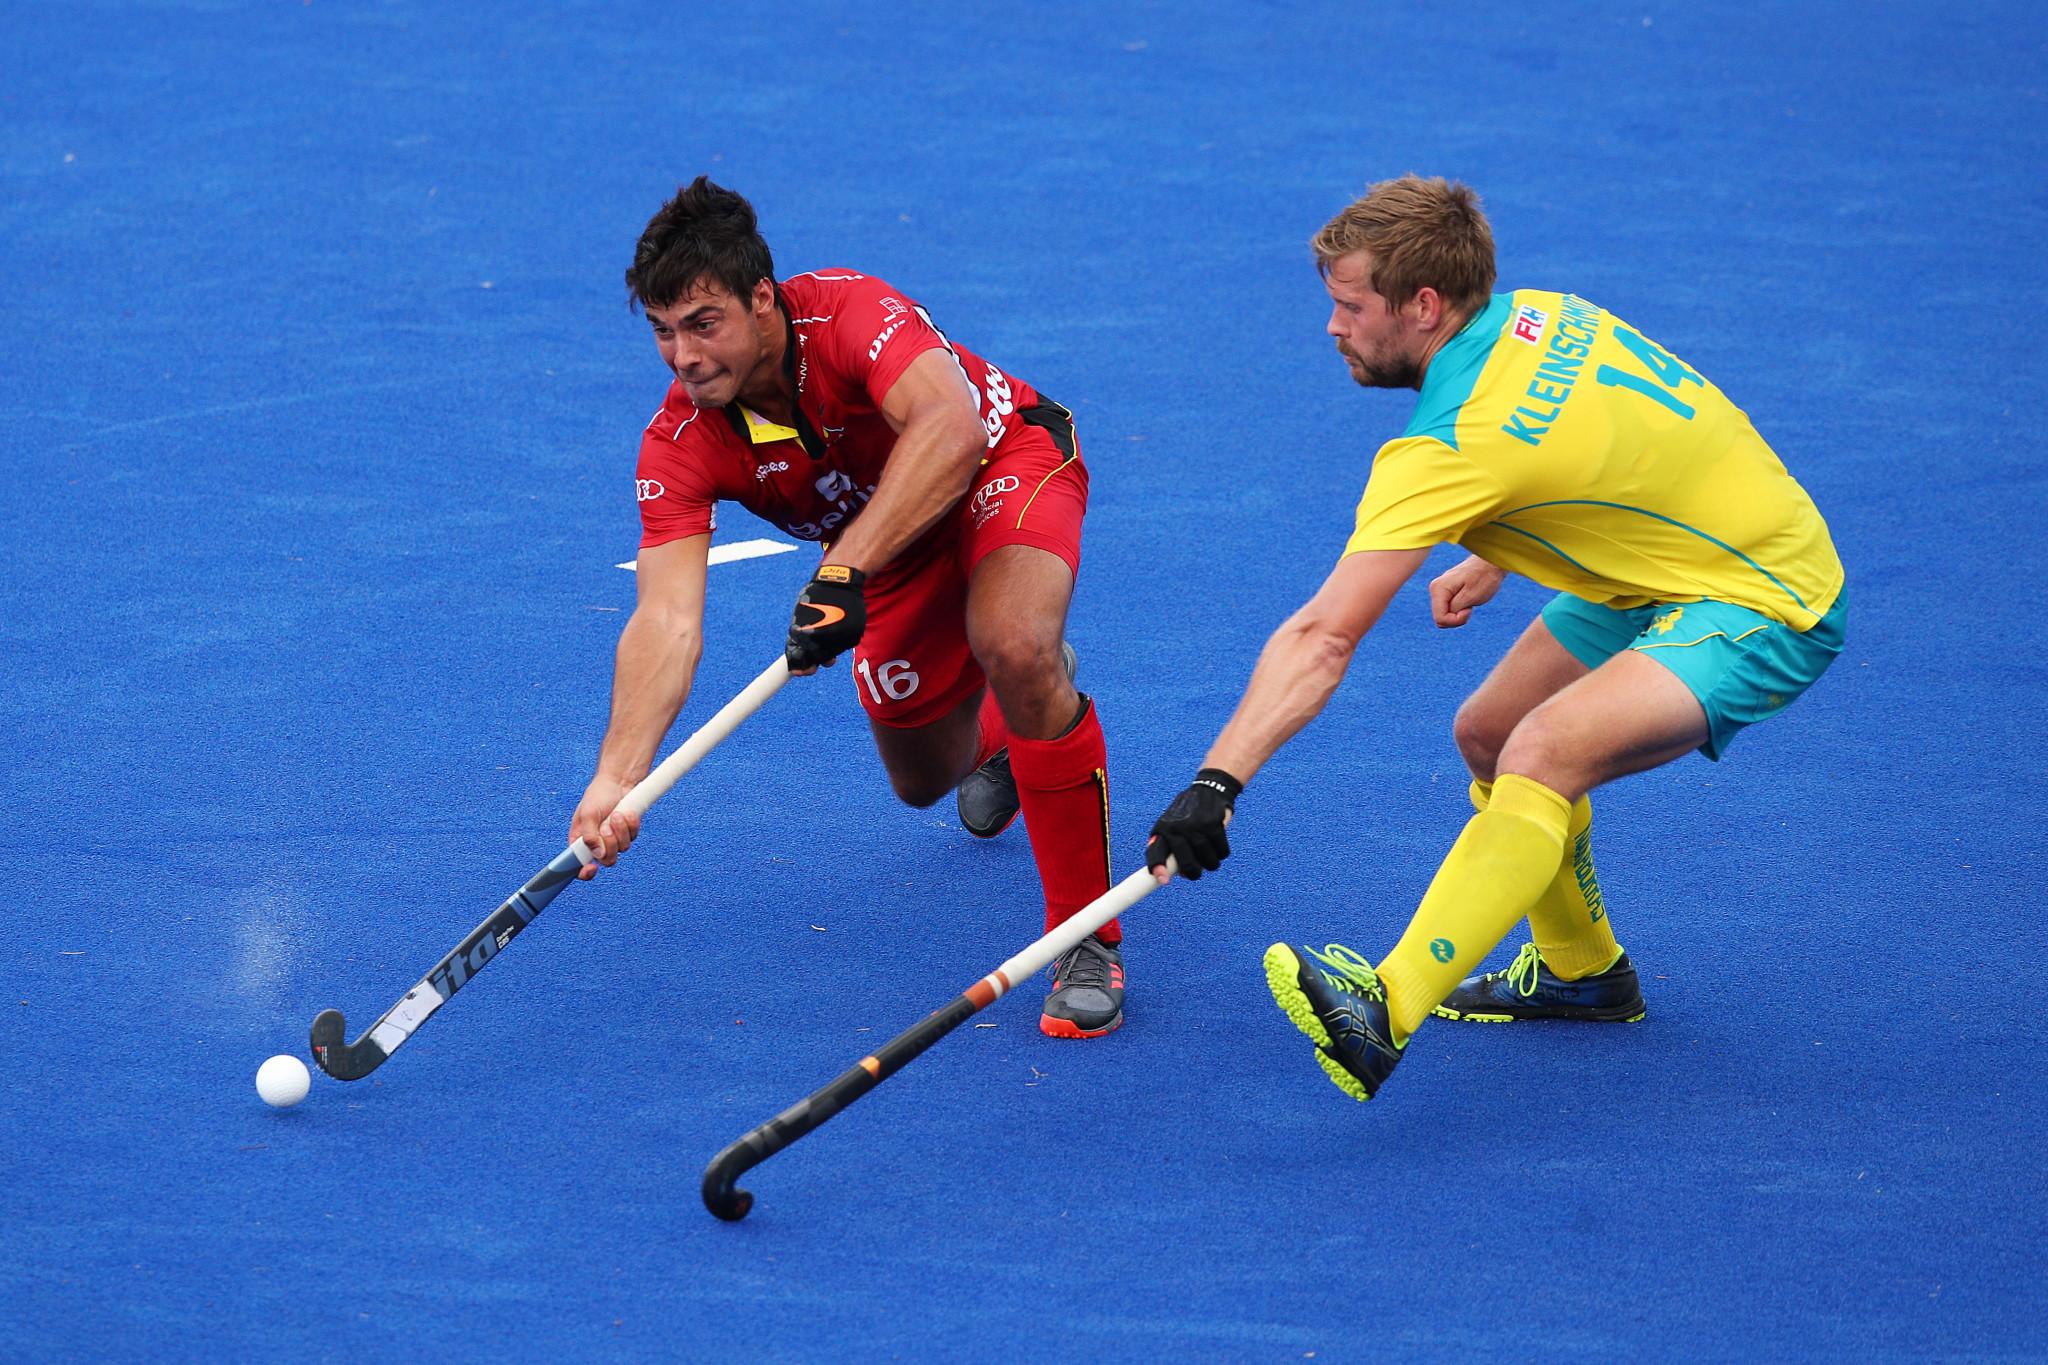 Belgium claim two victories against Australia in FIH Pro League